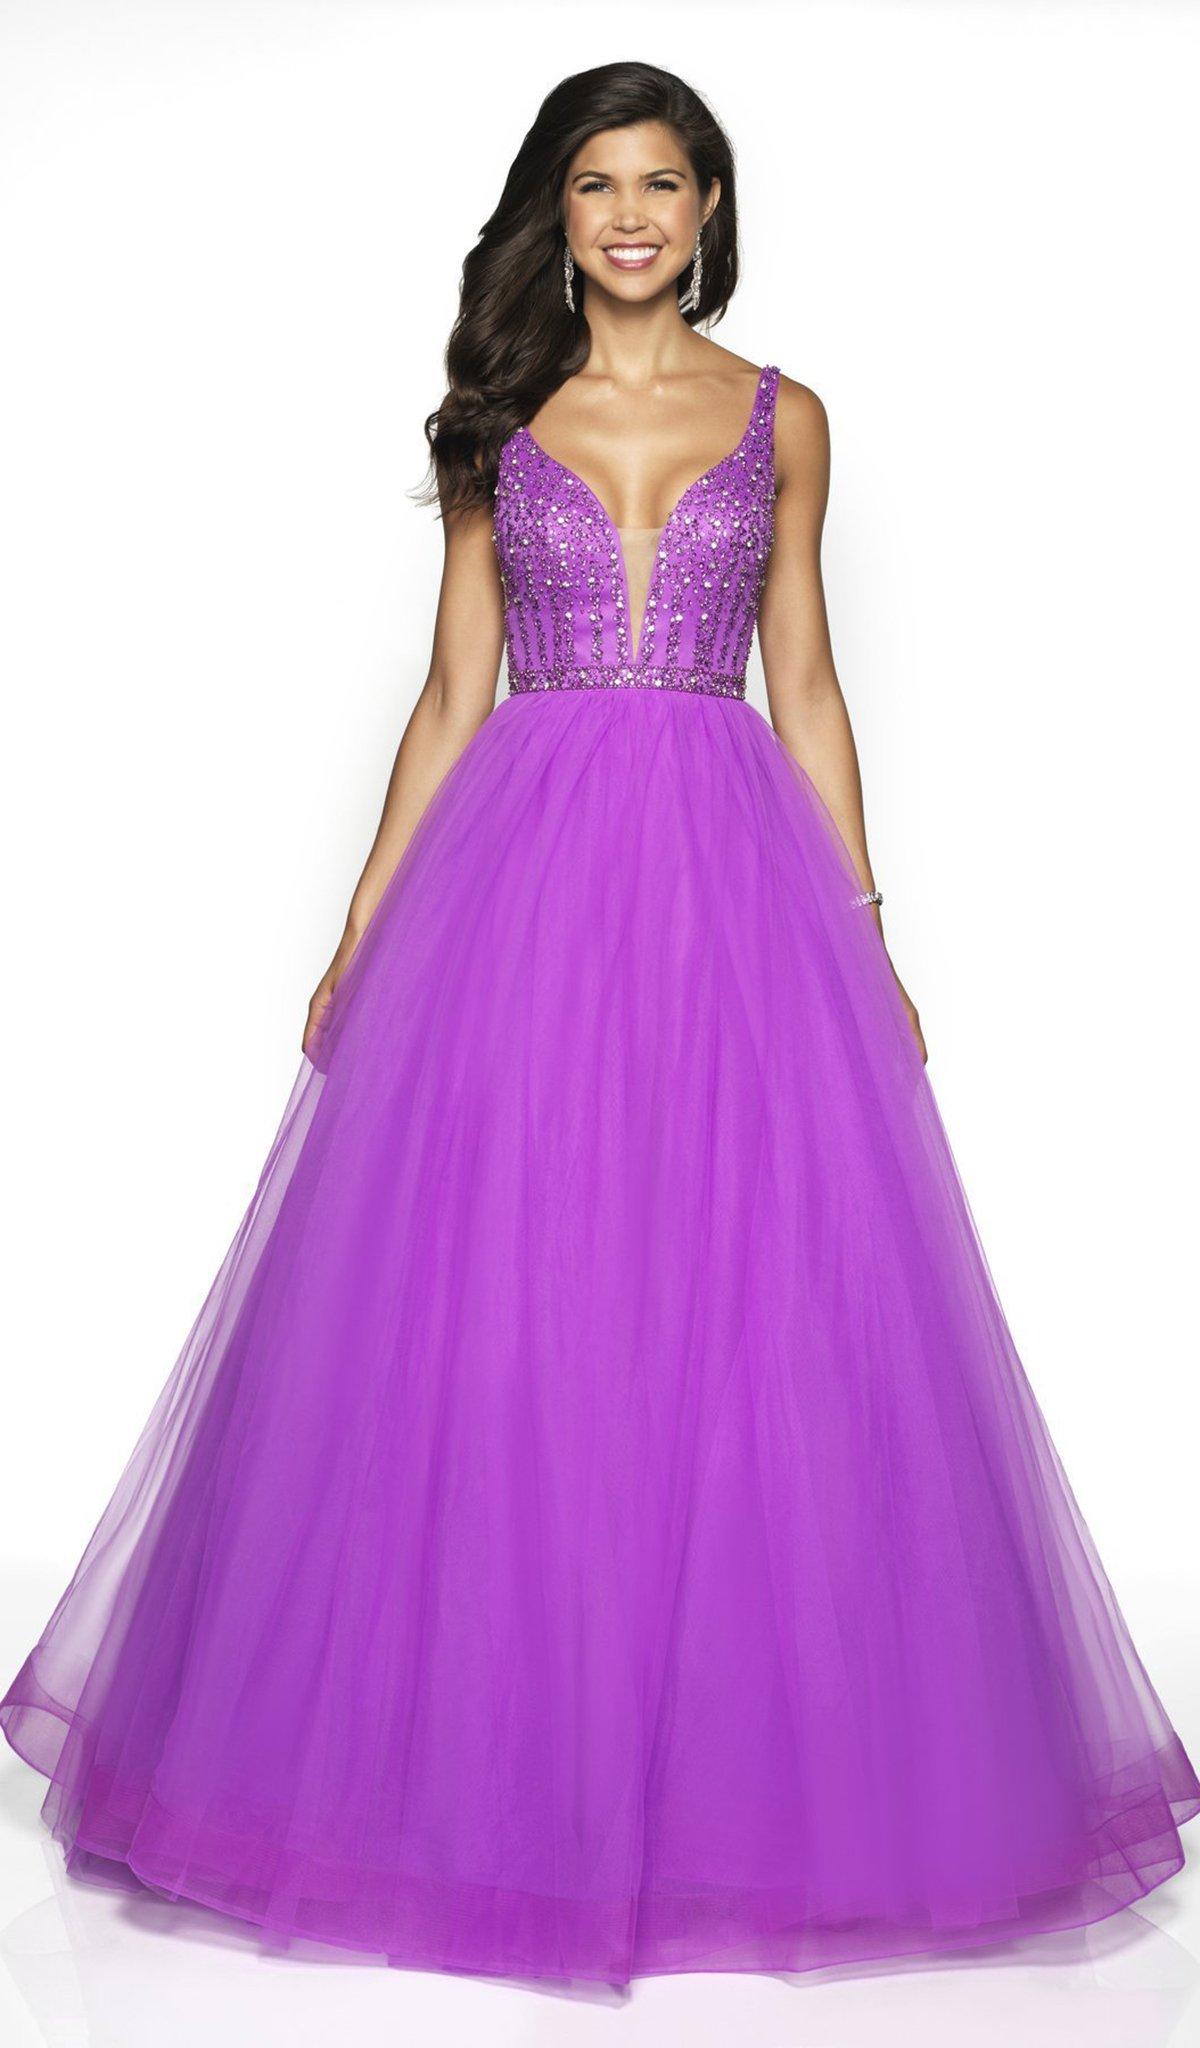 Blush by Alexia Designs - 5707 Beaded Deep V-neck Tulle Ballgown